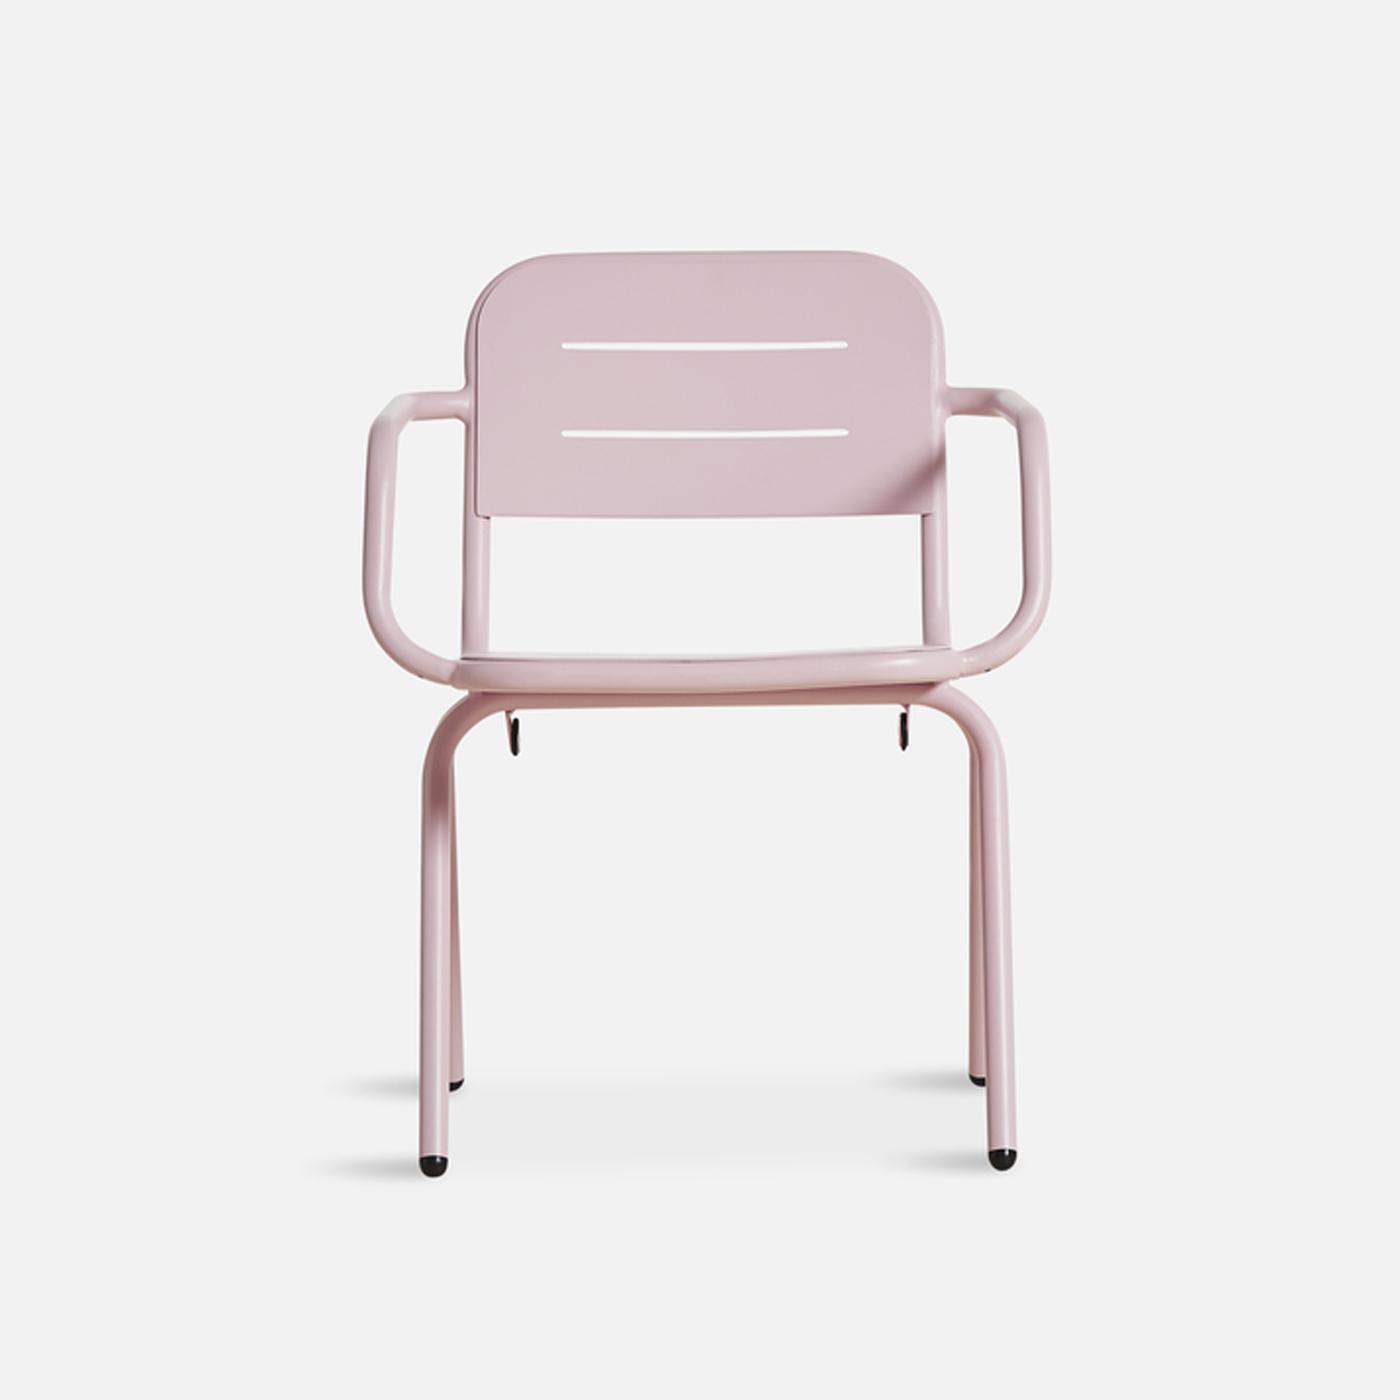 WOUD Ray spisebordsstol - lyserød aluminium, m. armlæn